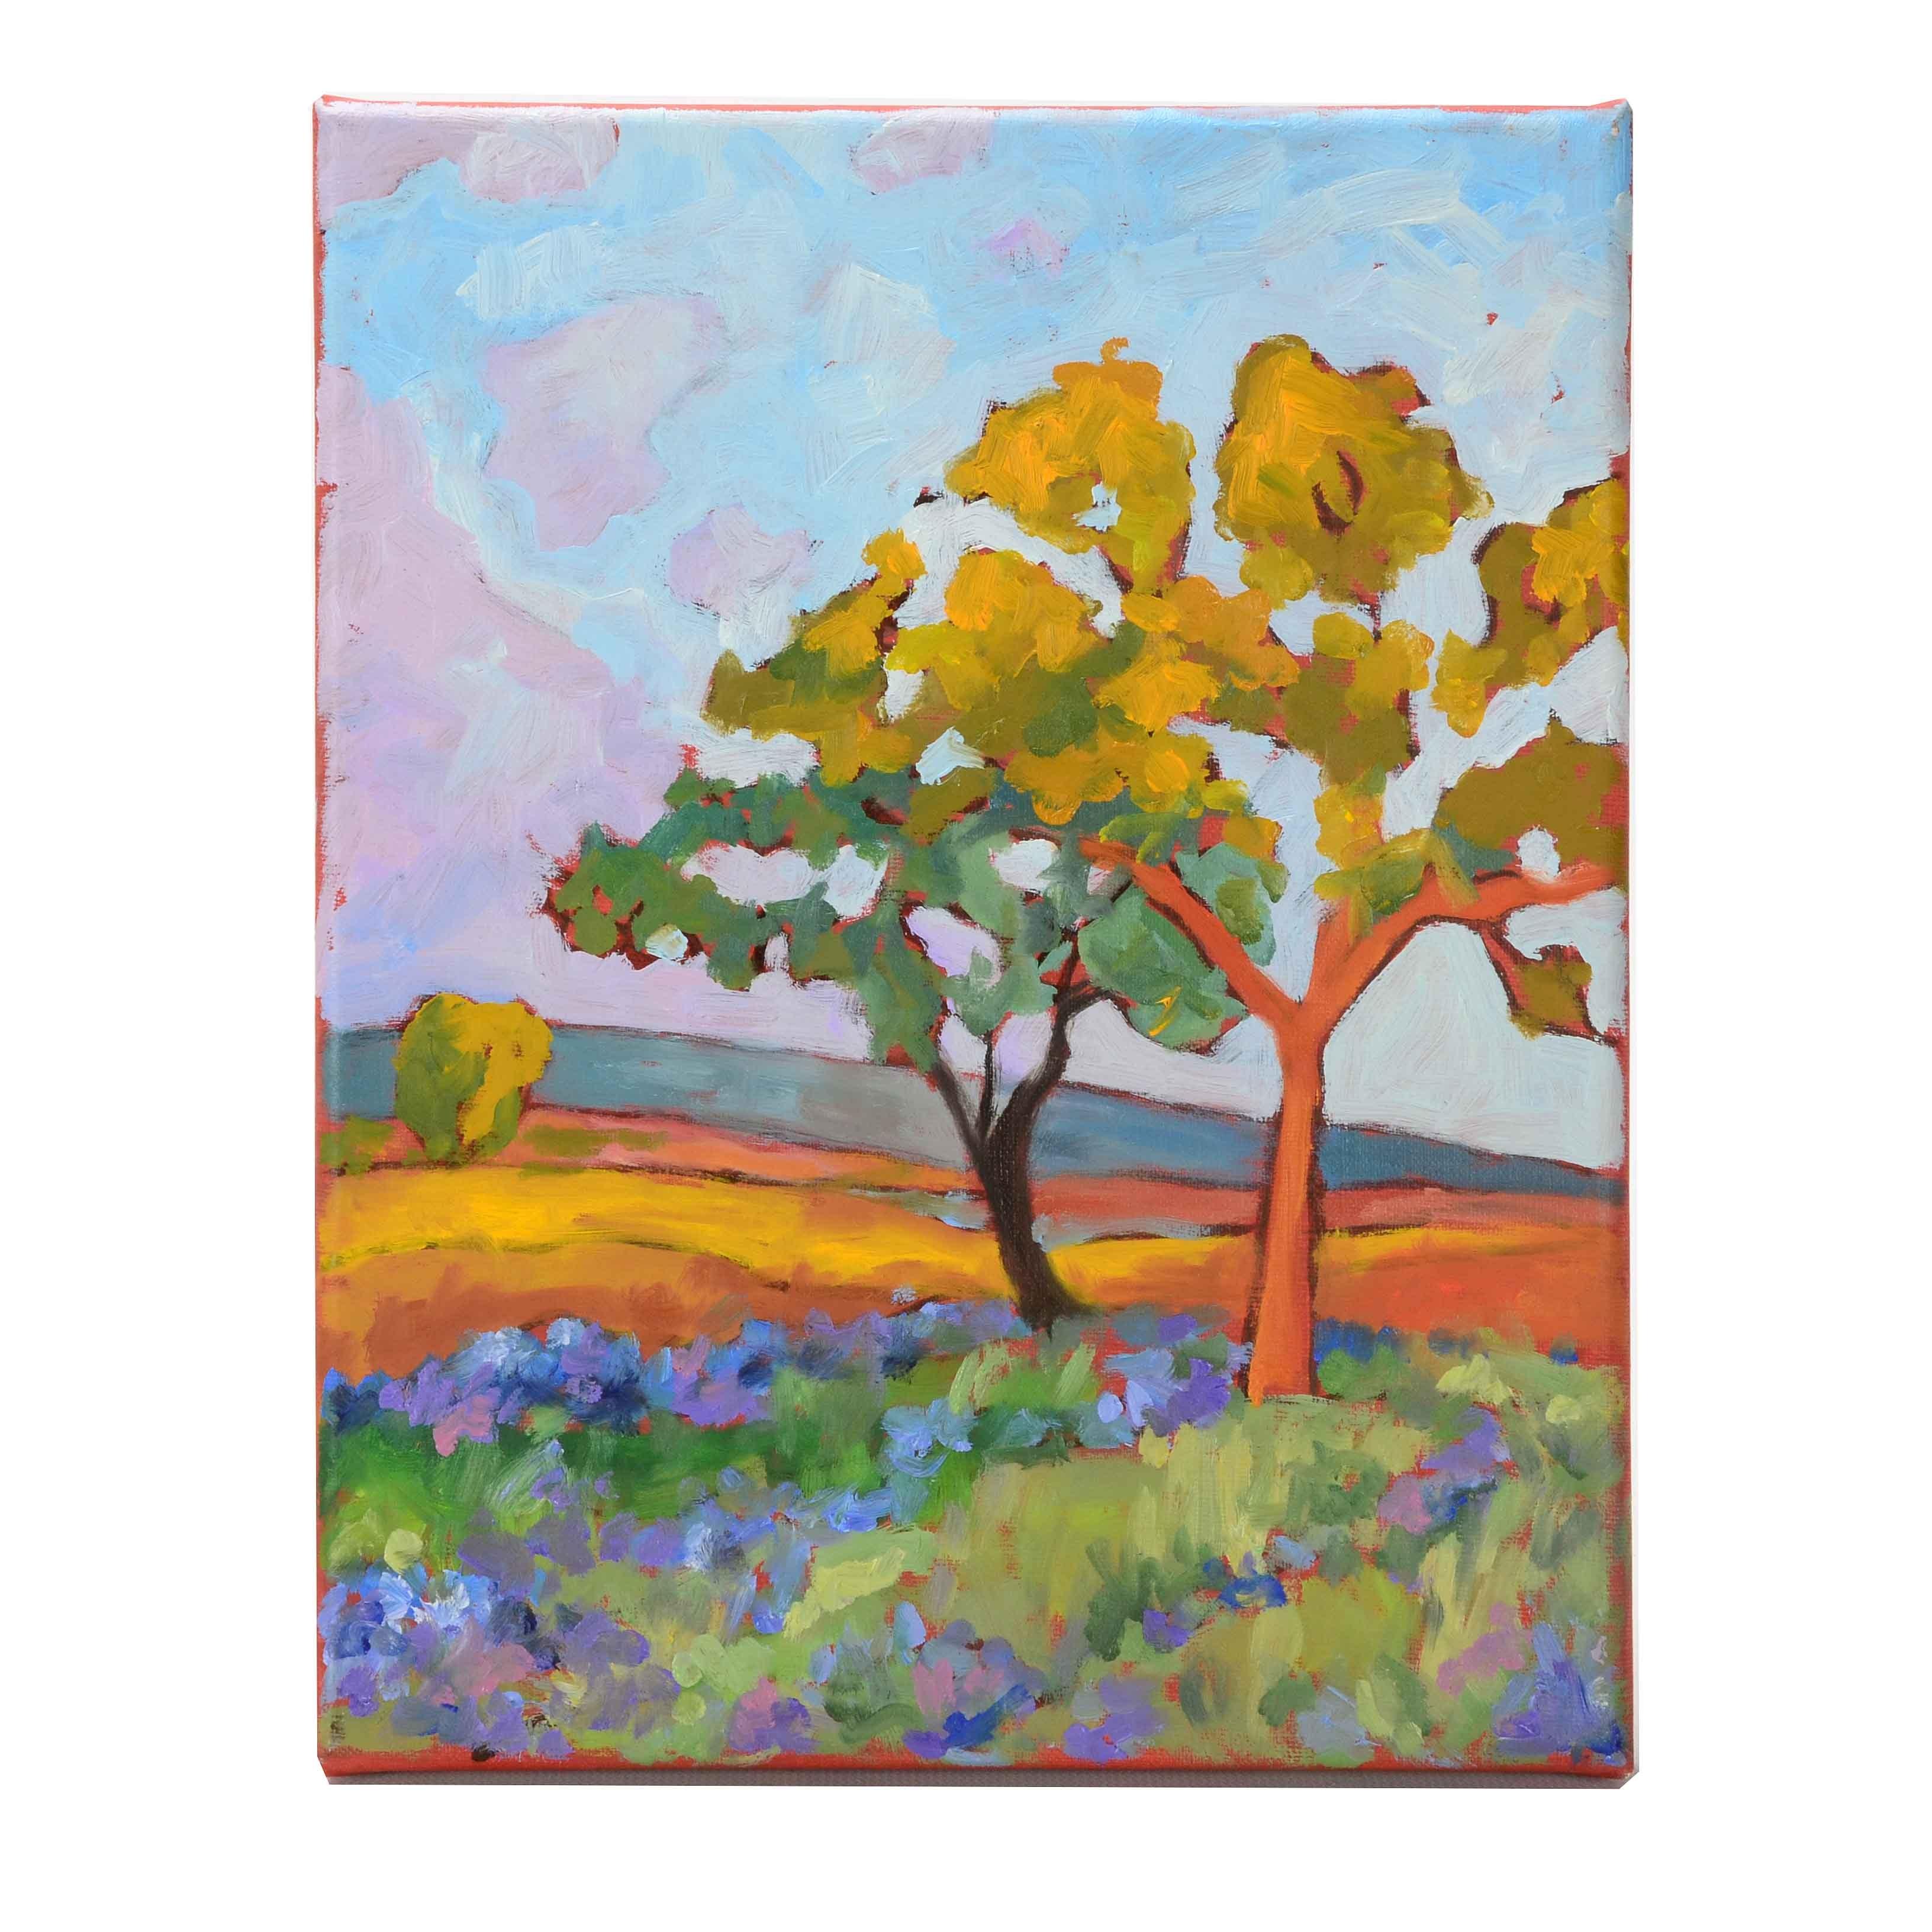 Original Oil Painting on Linen of a Landscape